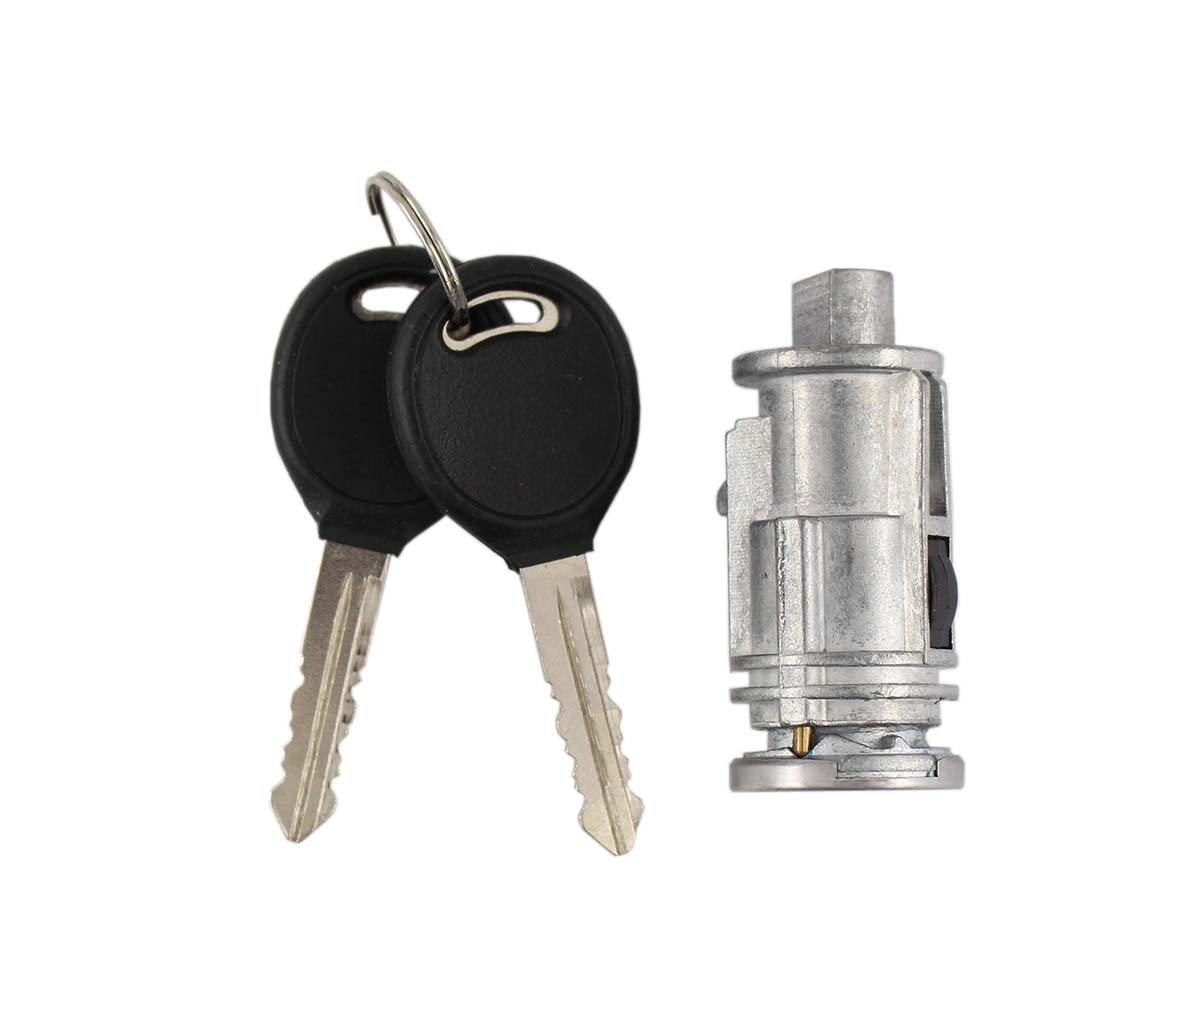 Xa Ignition Key Switch Lock Cylinder For Chrysler Dodge 2000 Plymouth Breeze Engine Diagram Jeep 703719c 703719 5003843ab Automotive